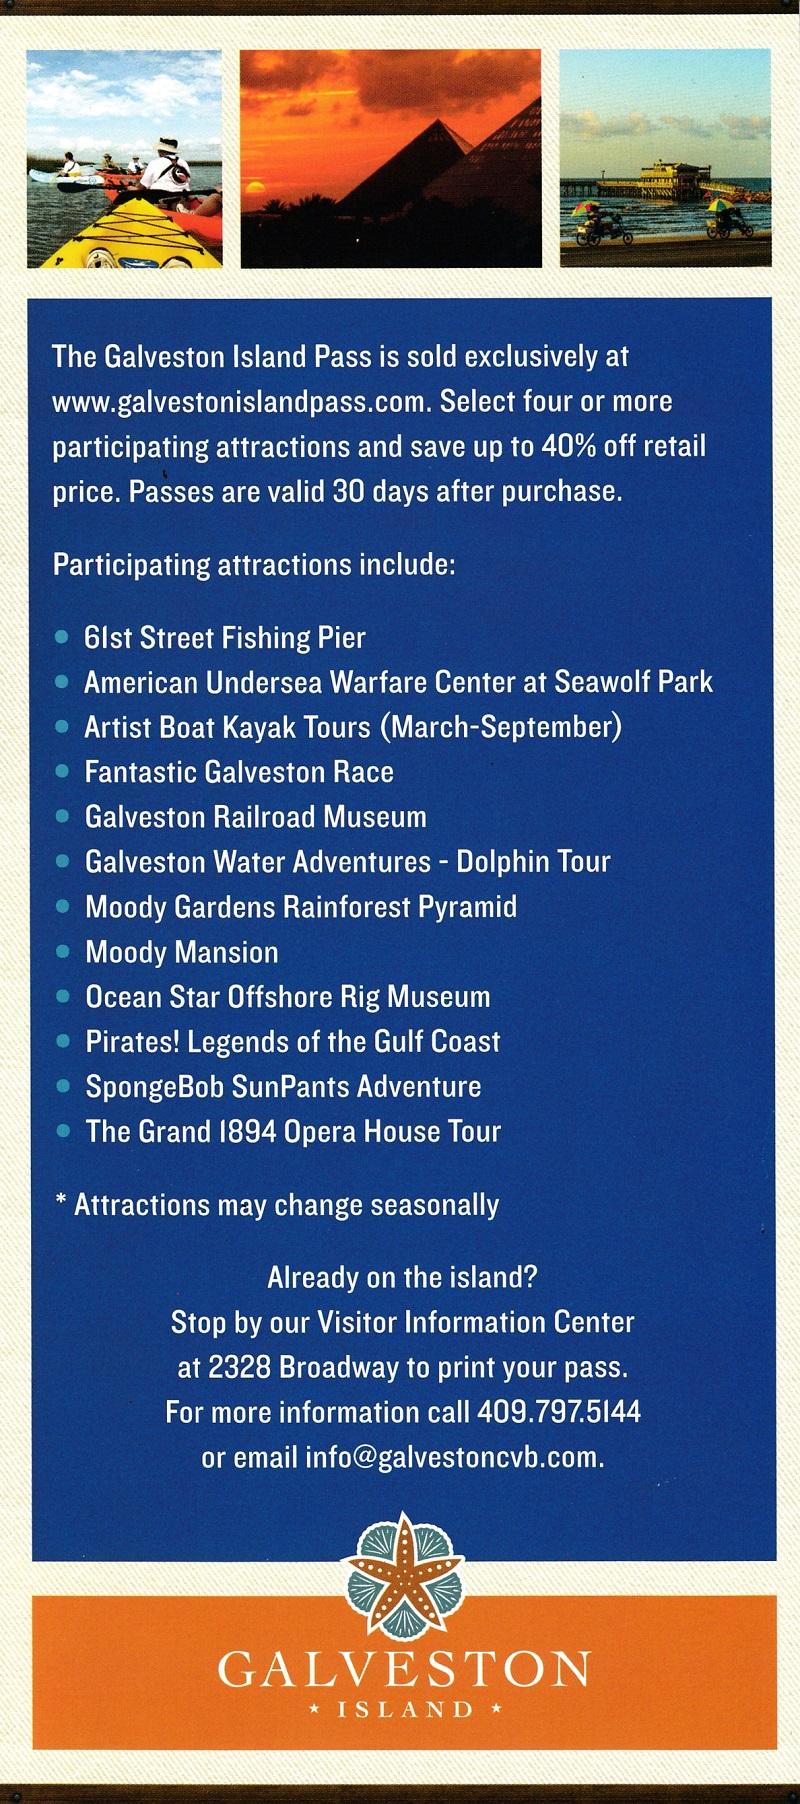 Galveston Island Pass brochure thumbnail